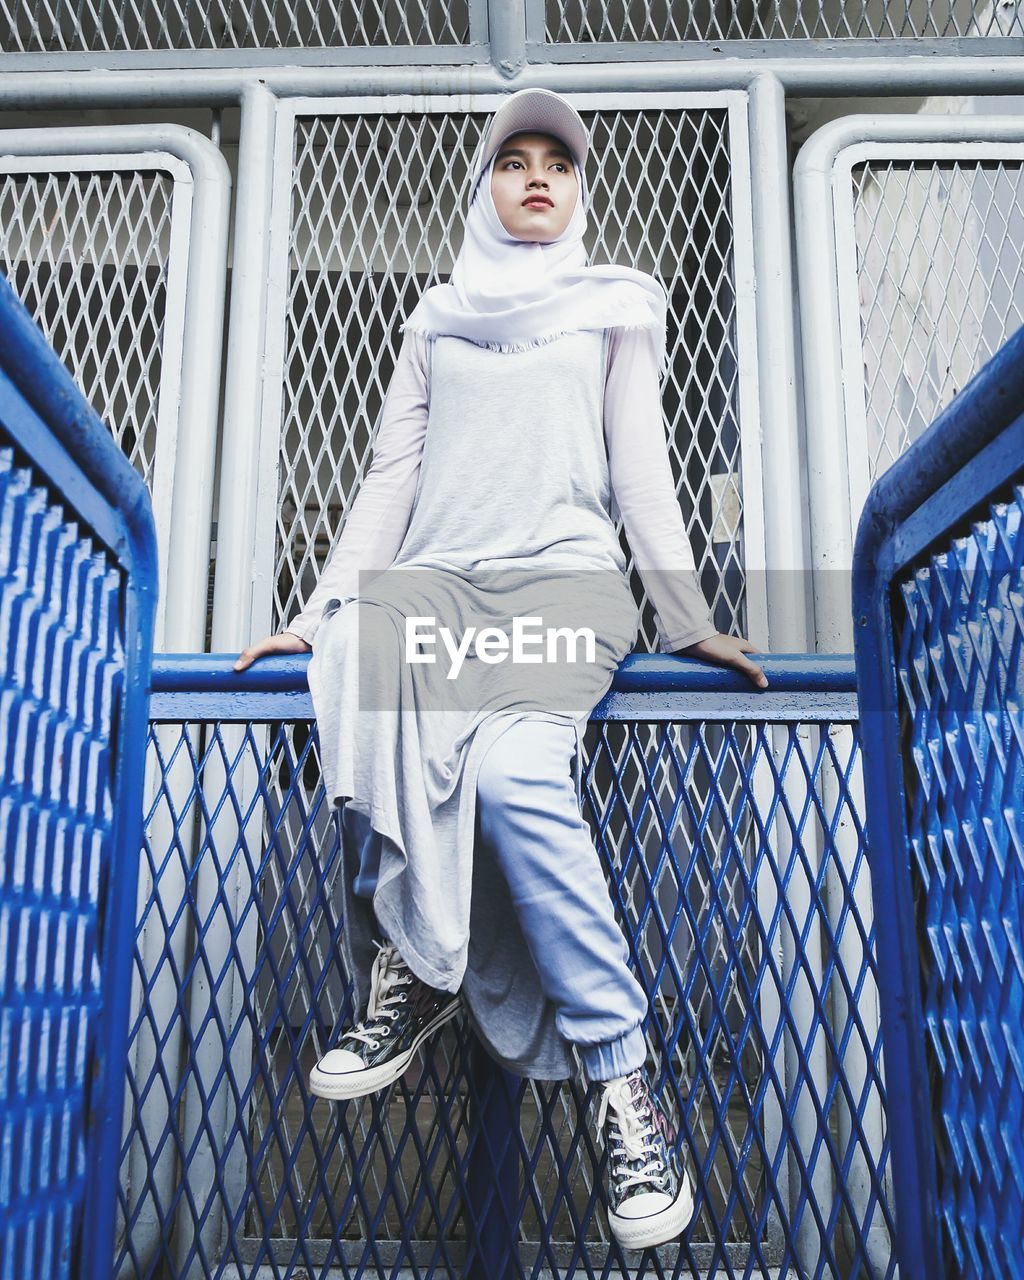 Low Angle View Of Woman Wearing Hijab Sitting On Railing